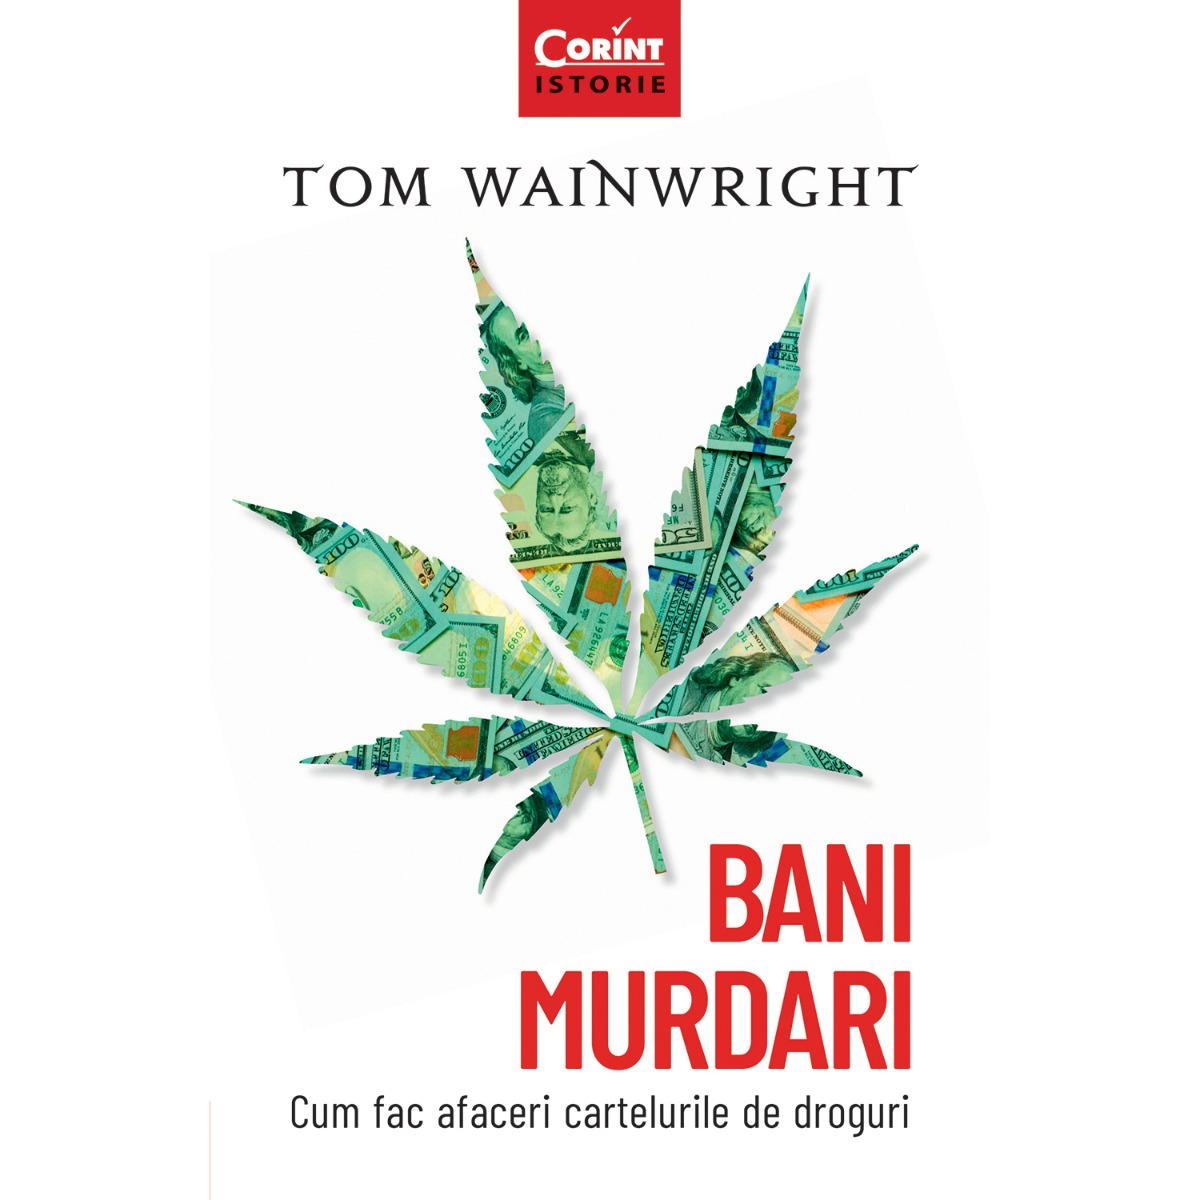 Carte Editura Corint, Bani murdari. Cum fac afaceri cartelurile de droguri, Tom Wainwright imagine